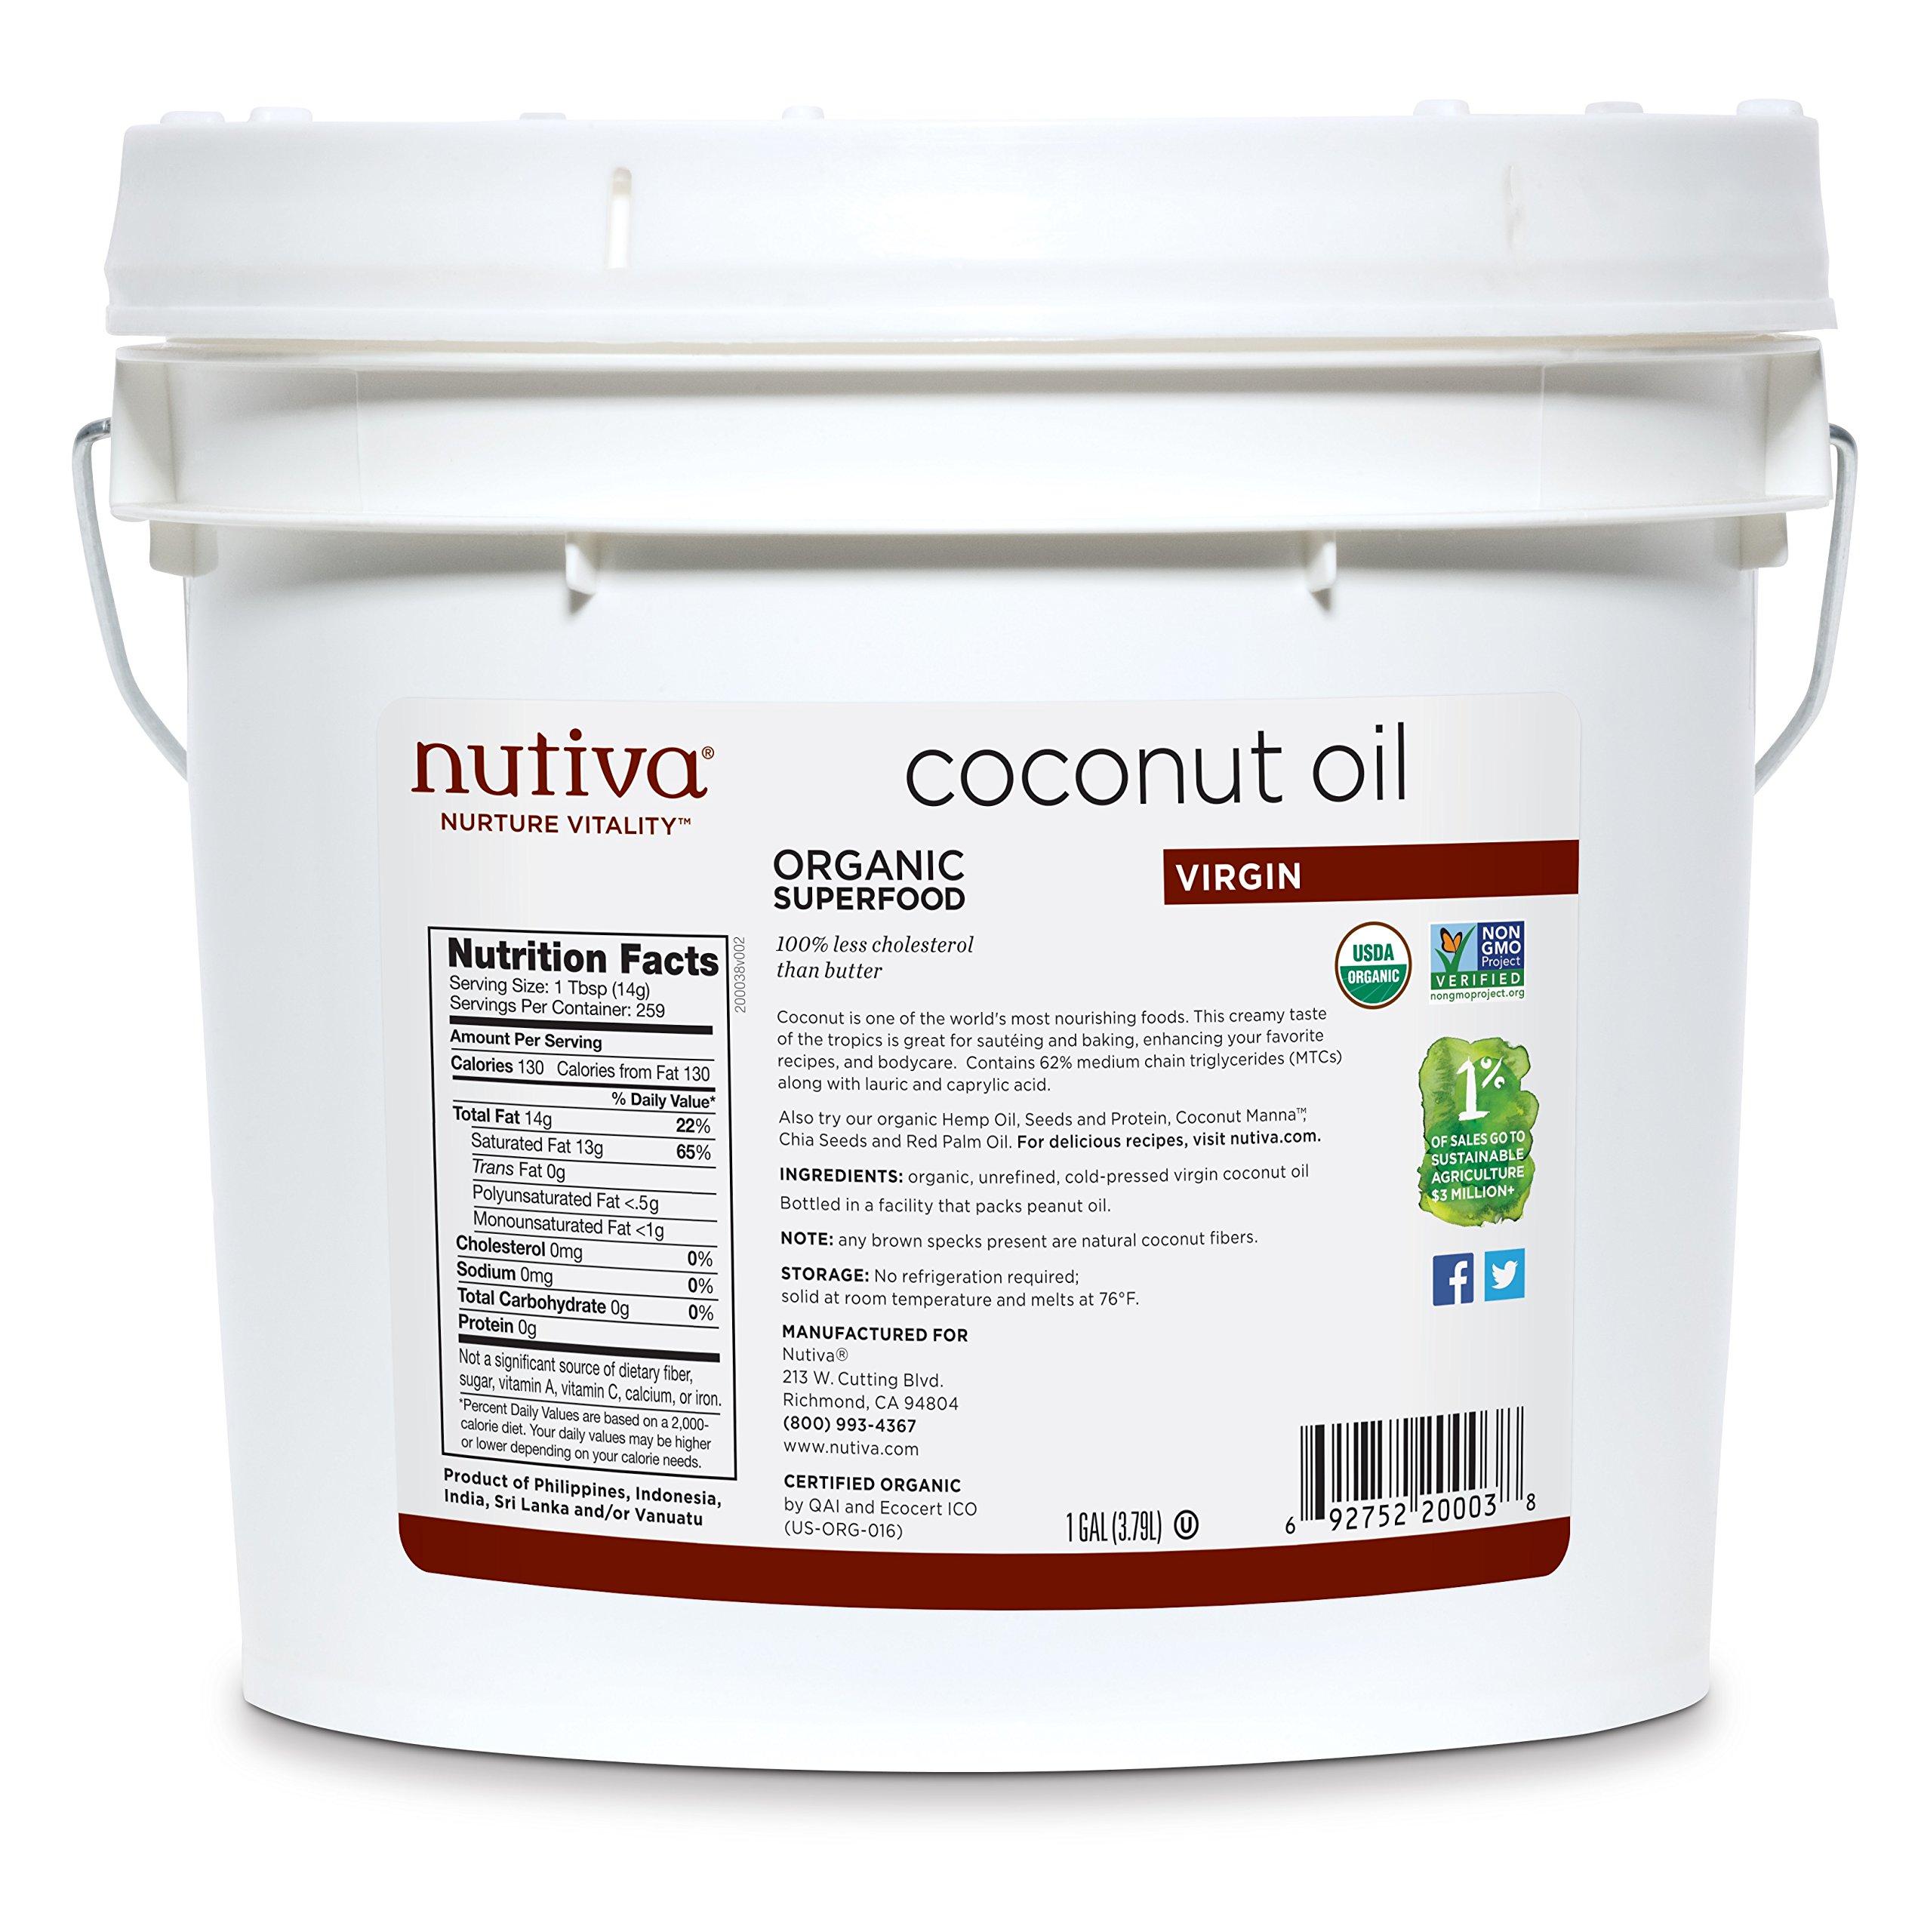 Nutiva Organic, Unrefined, Virgin Coconut Oil, 128 Fl Oz (Pack of 1) by Nutiva